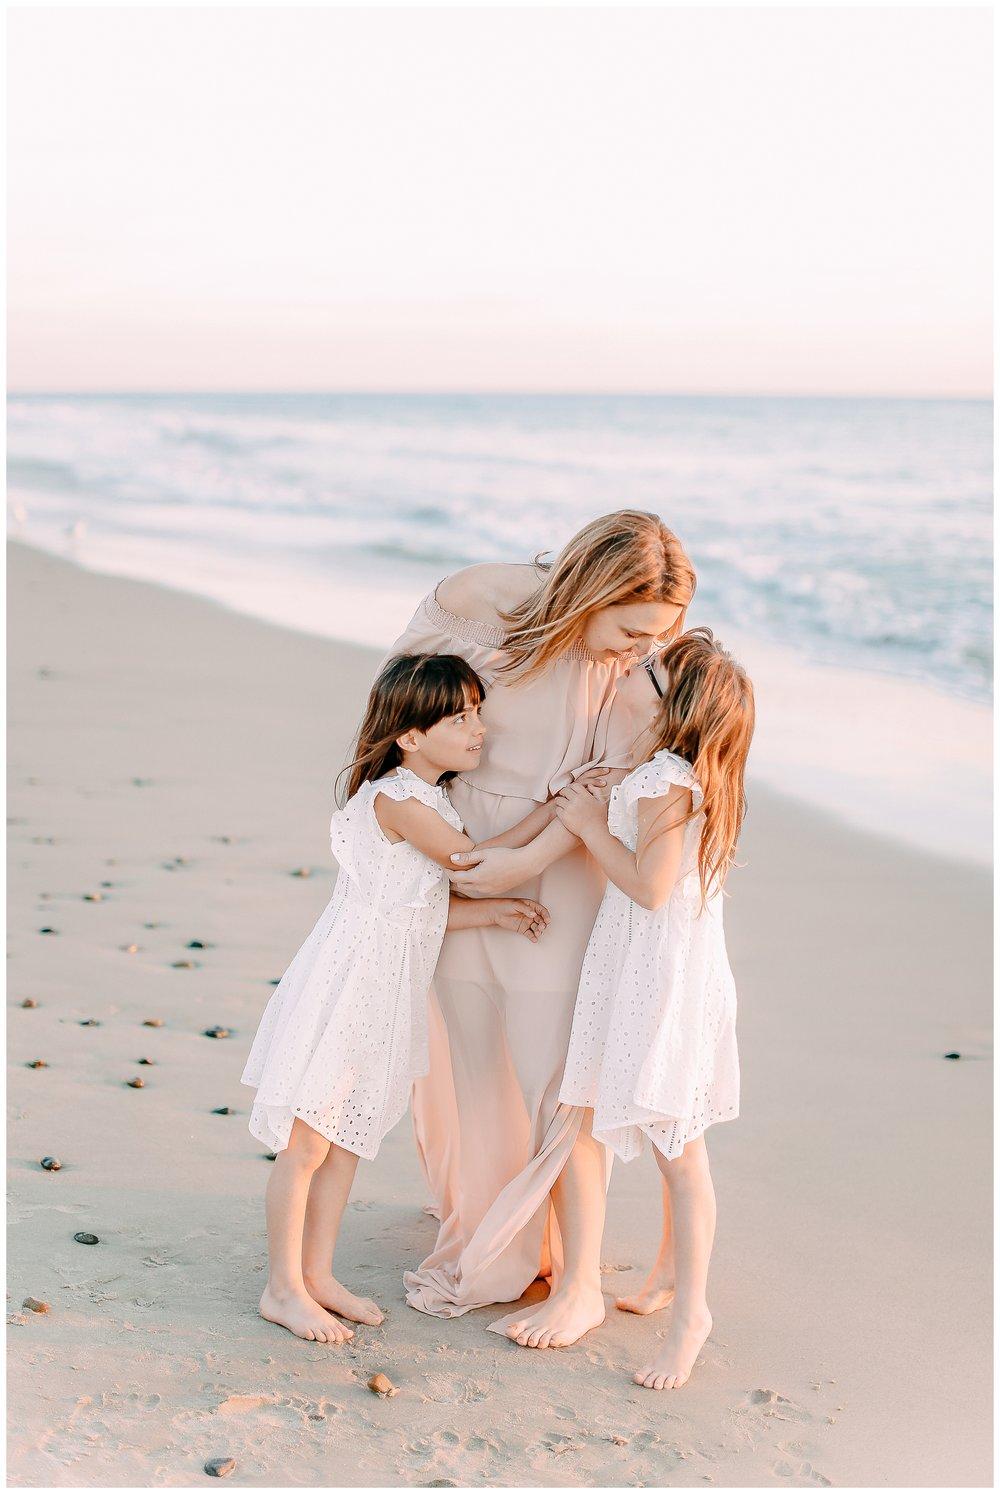 San_clemente_family_session_Orange_county_family_photographer_cori_kleckner_photography_laguna_beach_family_session_0692.jpg